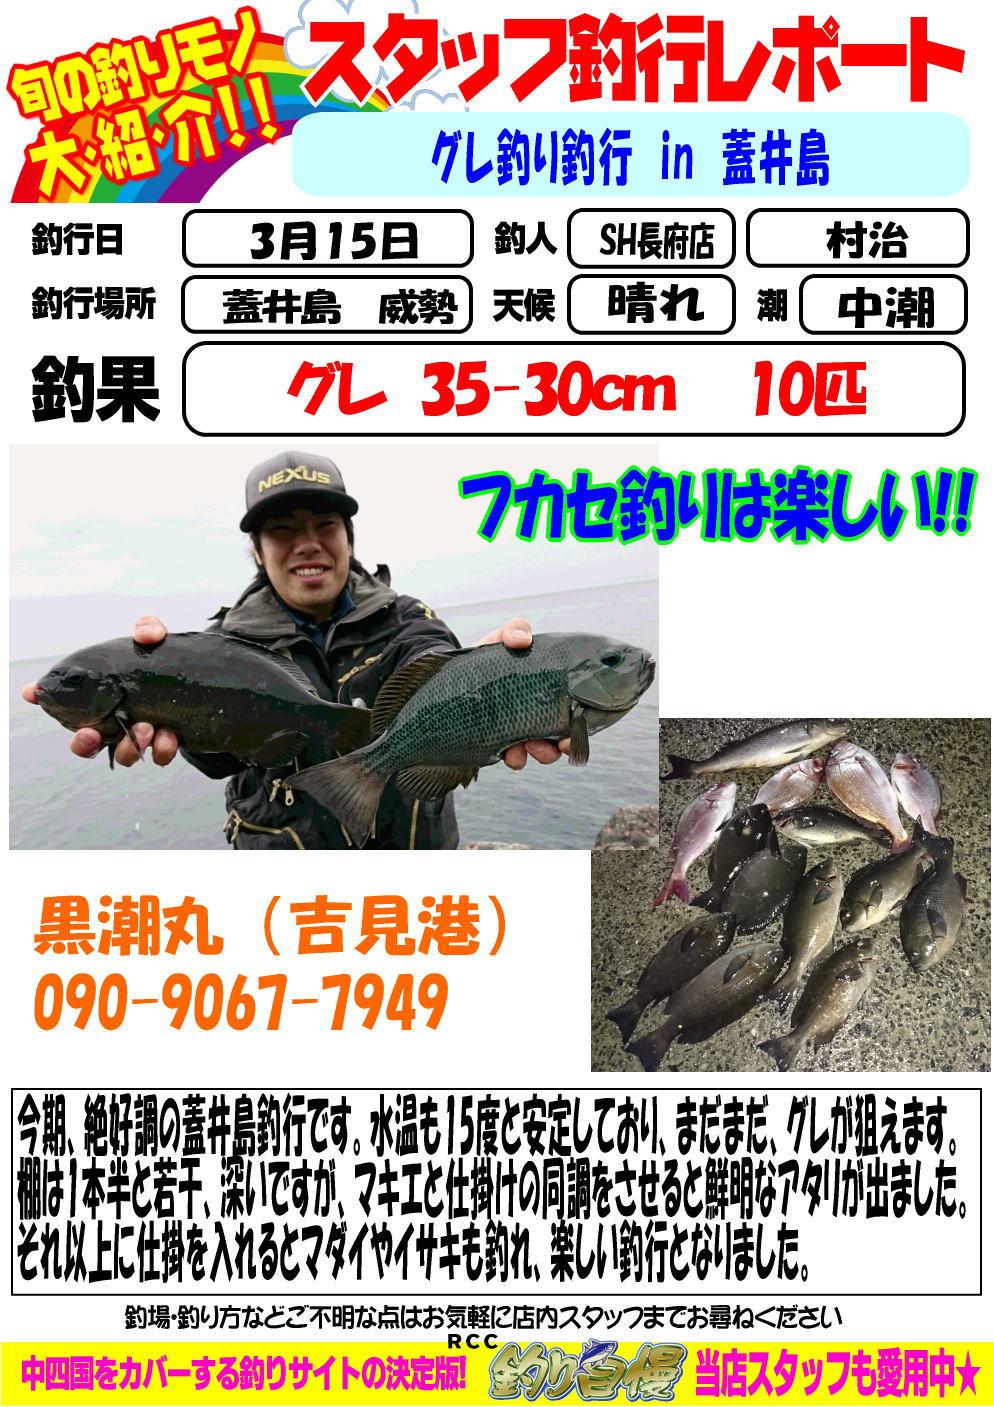 http://www.e-angle.co.jp/shop/blog/blog-choufu-20180315-murati.jpg